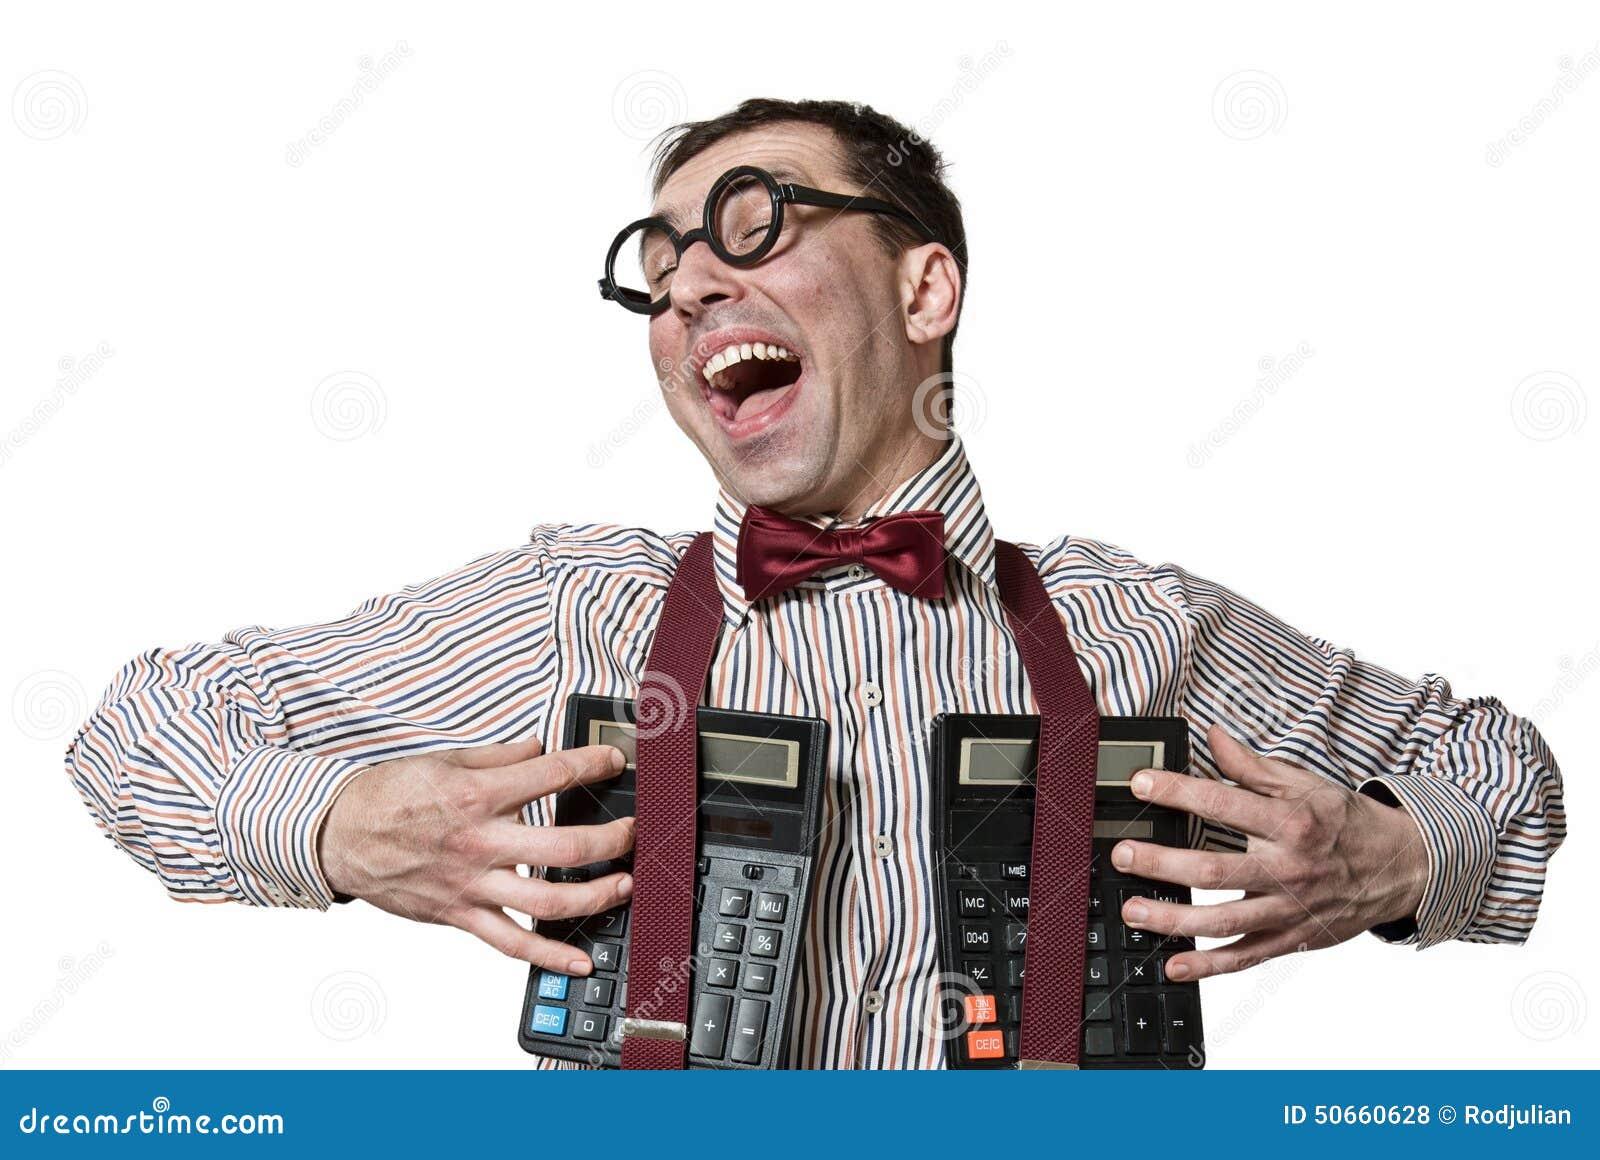 Funny accountant stock photo. Image of expressive, balance ...